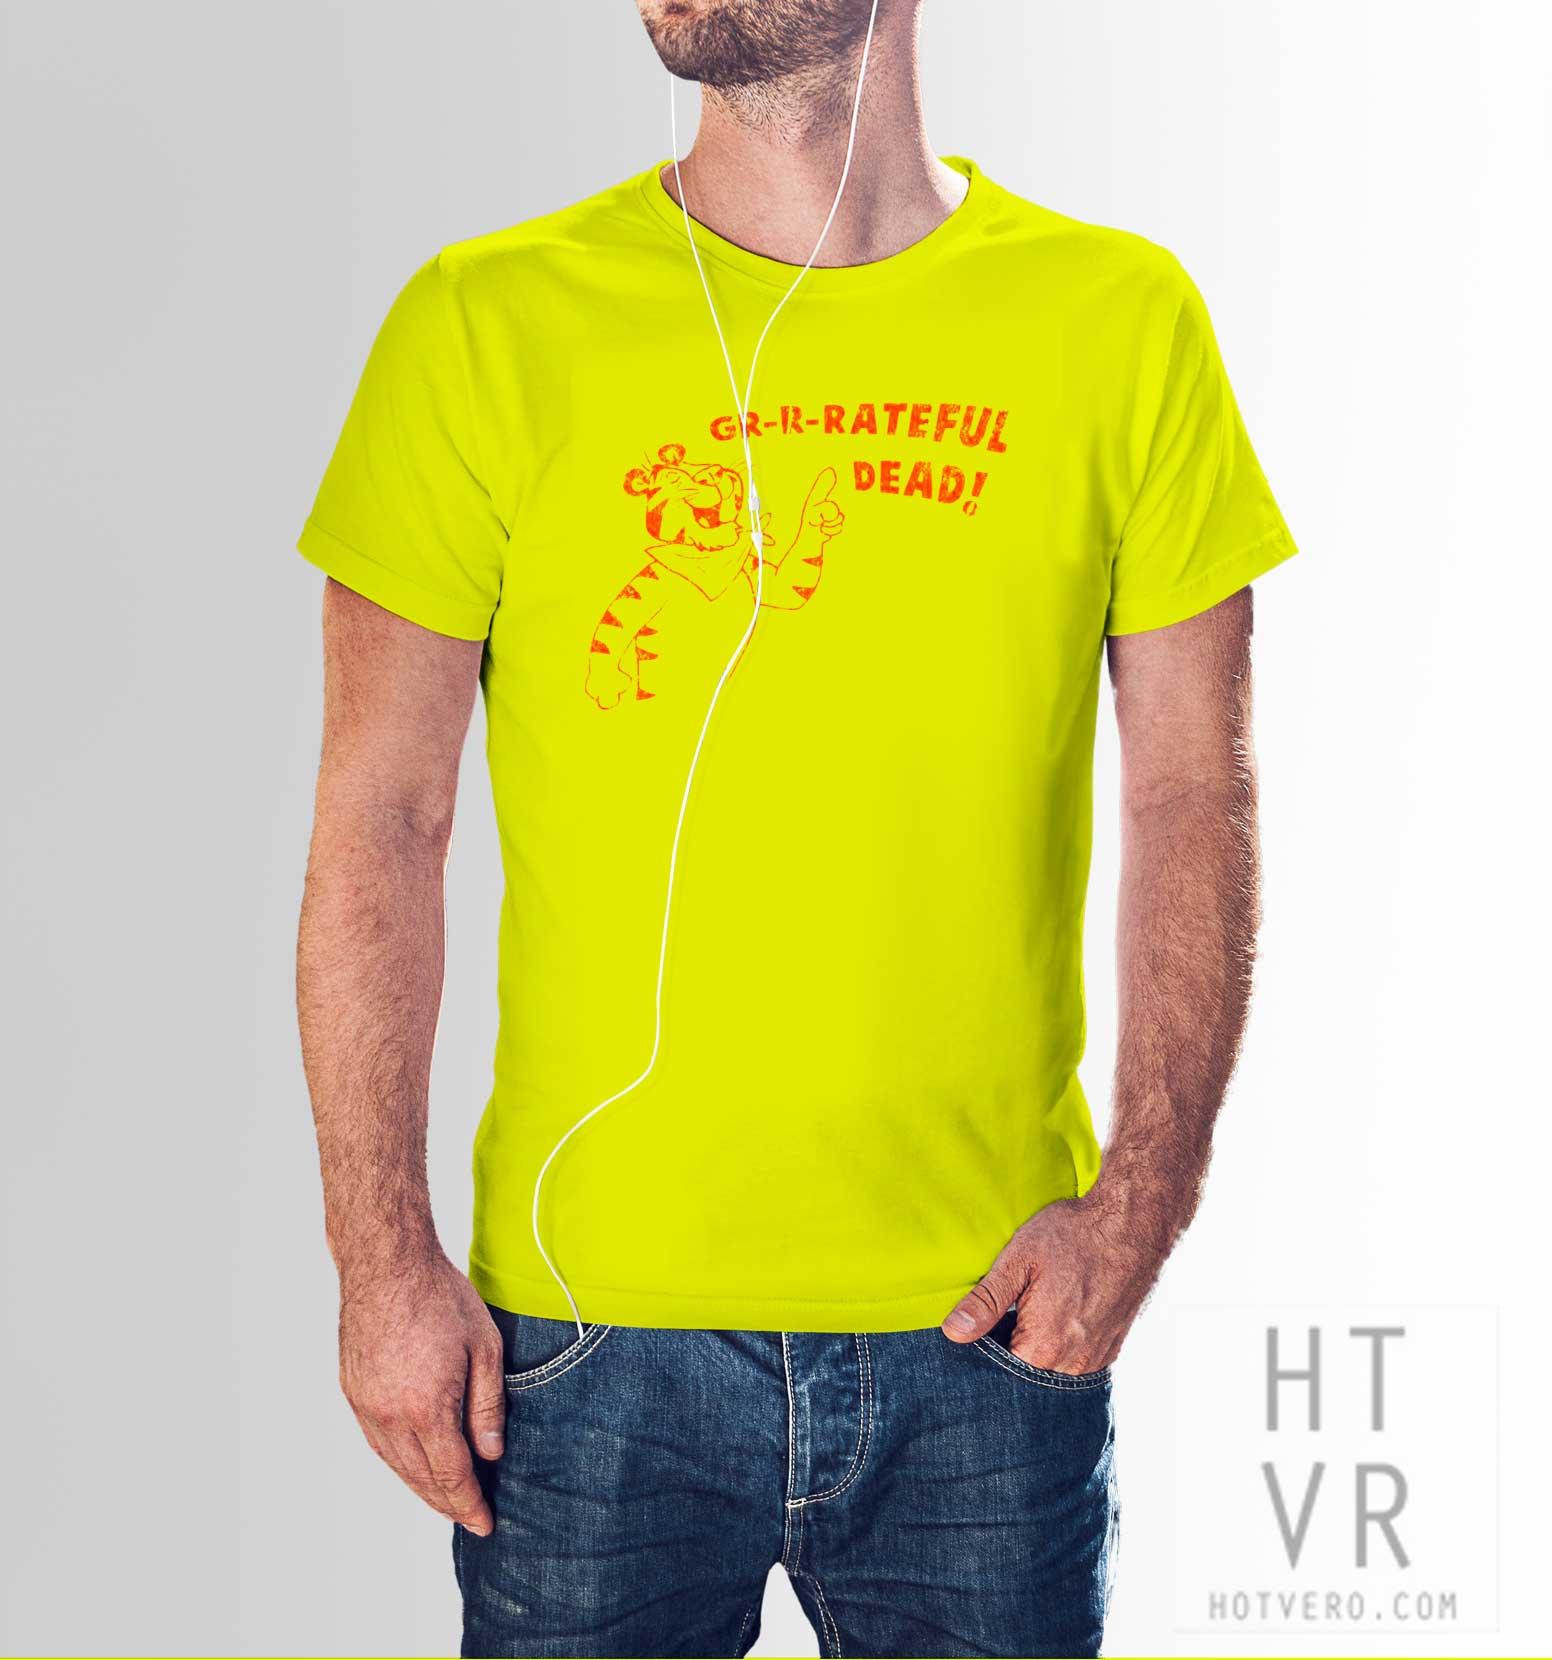 daaf6c47 Vintage Grateful Dead Concert T Shirt Tony The Tiger Tee